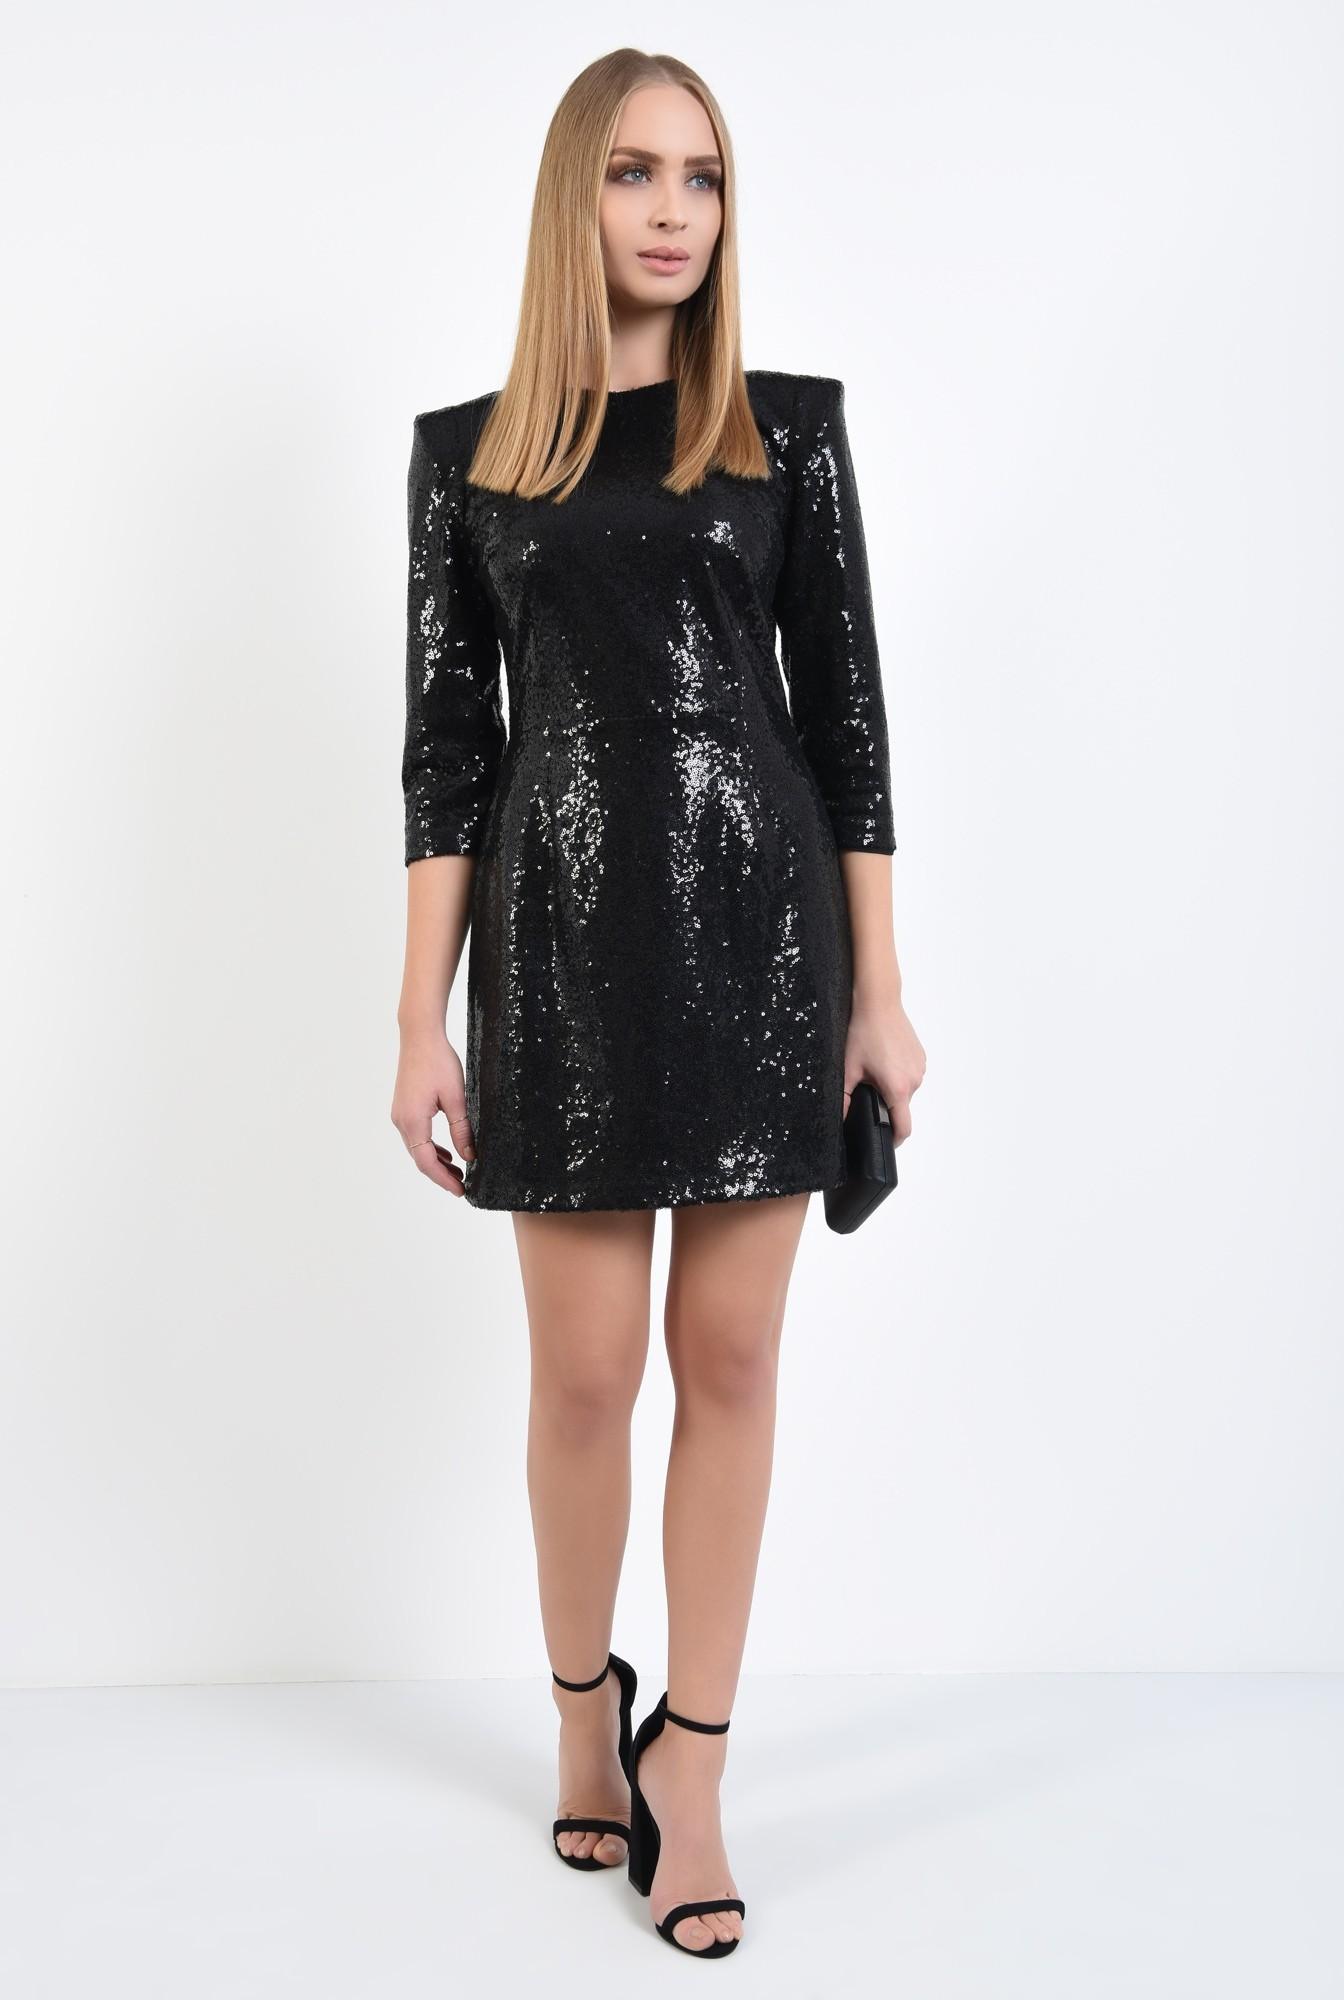 3 - rochie de ocazie, neagra, din paiete, cambrata, scurta